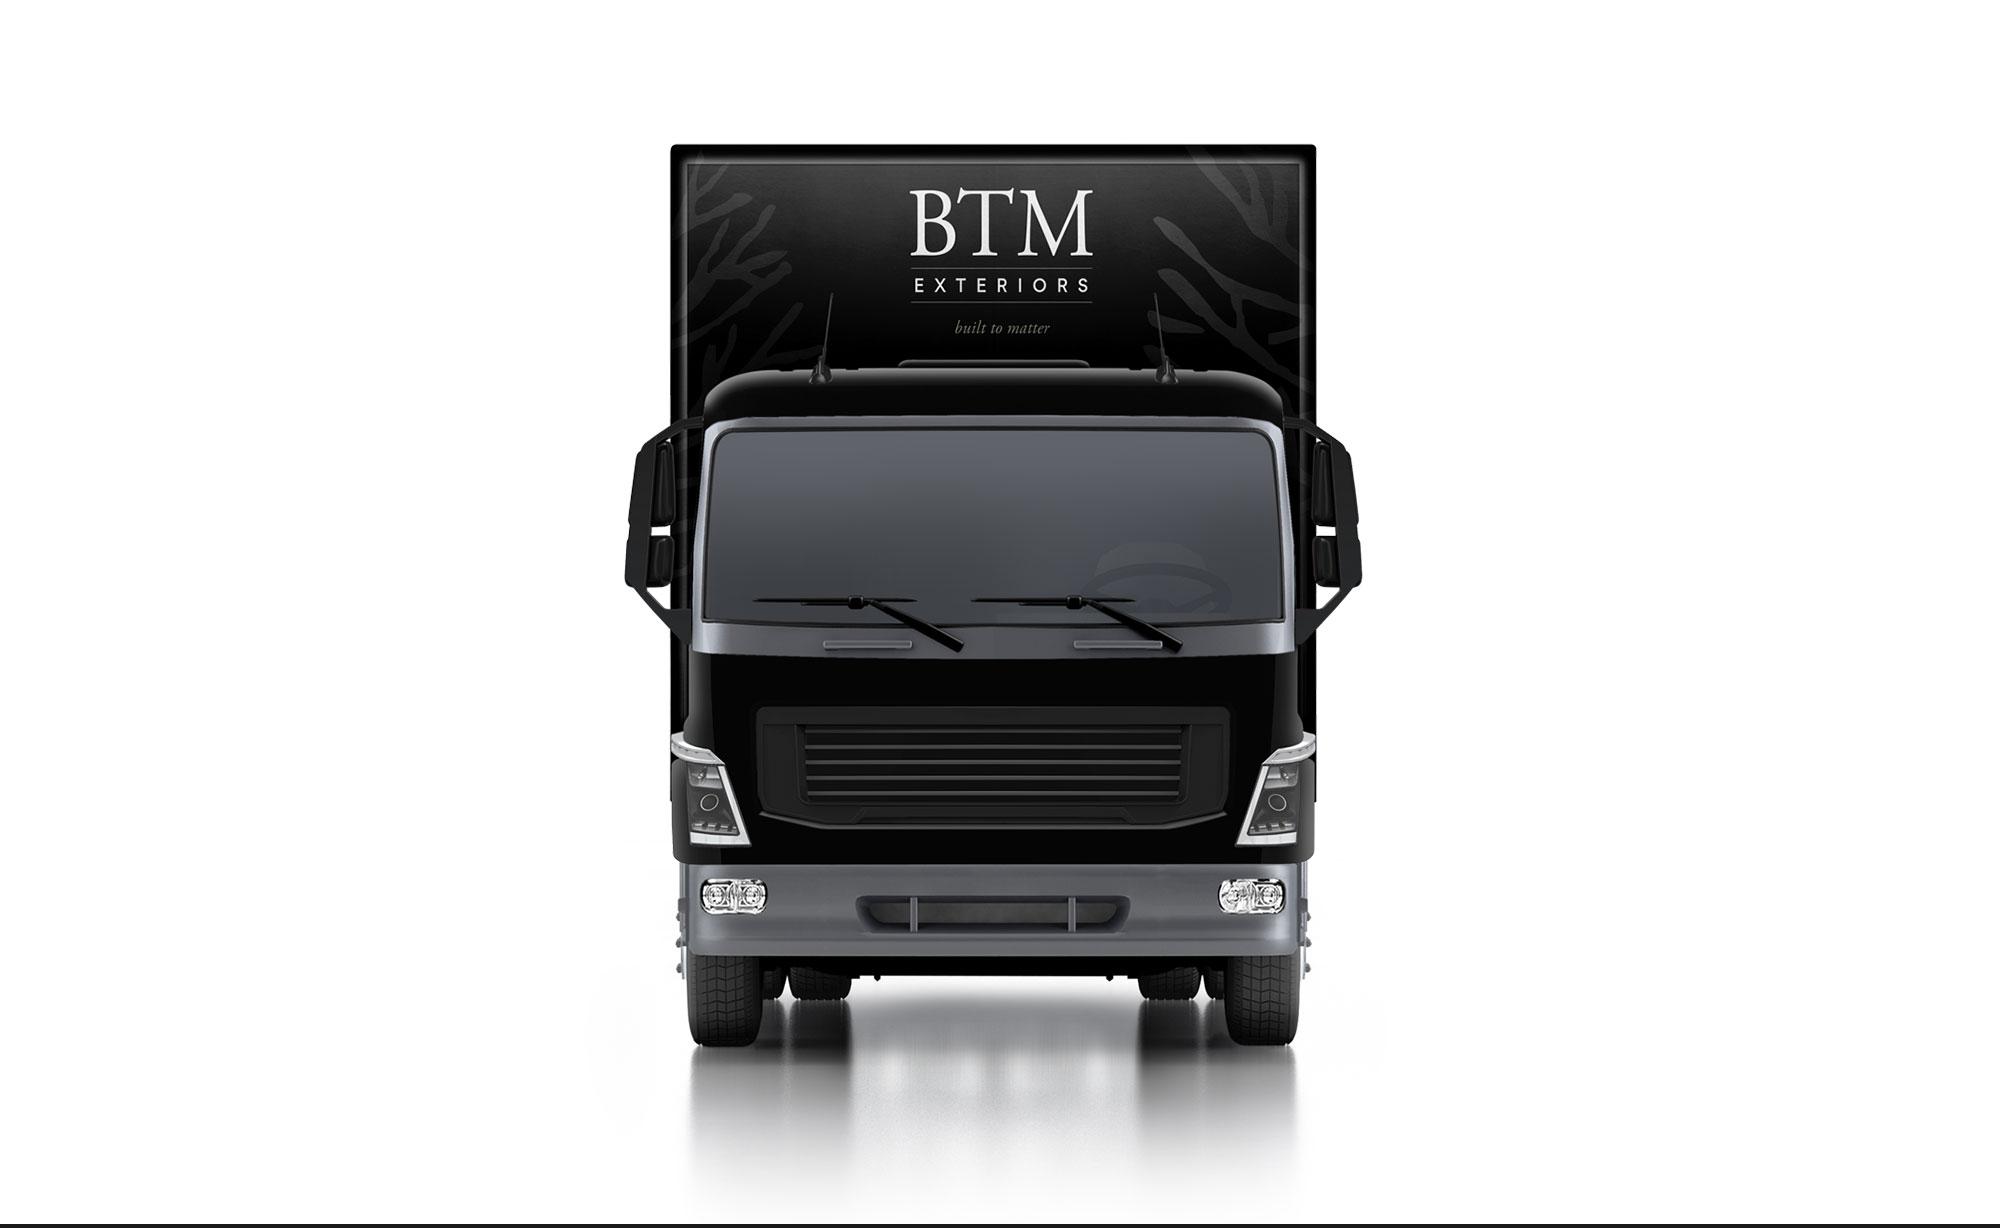 ©-Chris-Rae-Design-BTM-Exteriors-Vehicle-Truck-Design-02.jpg